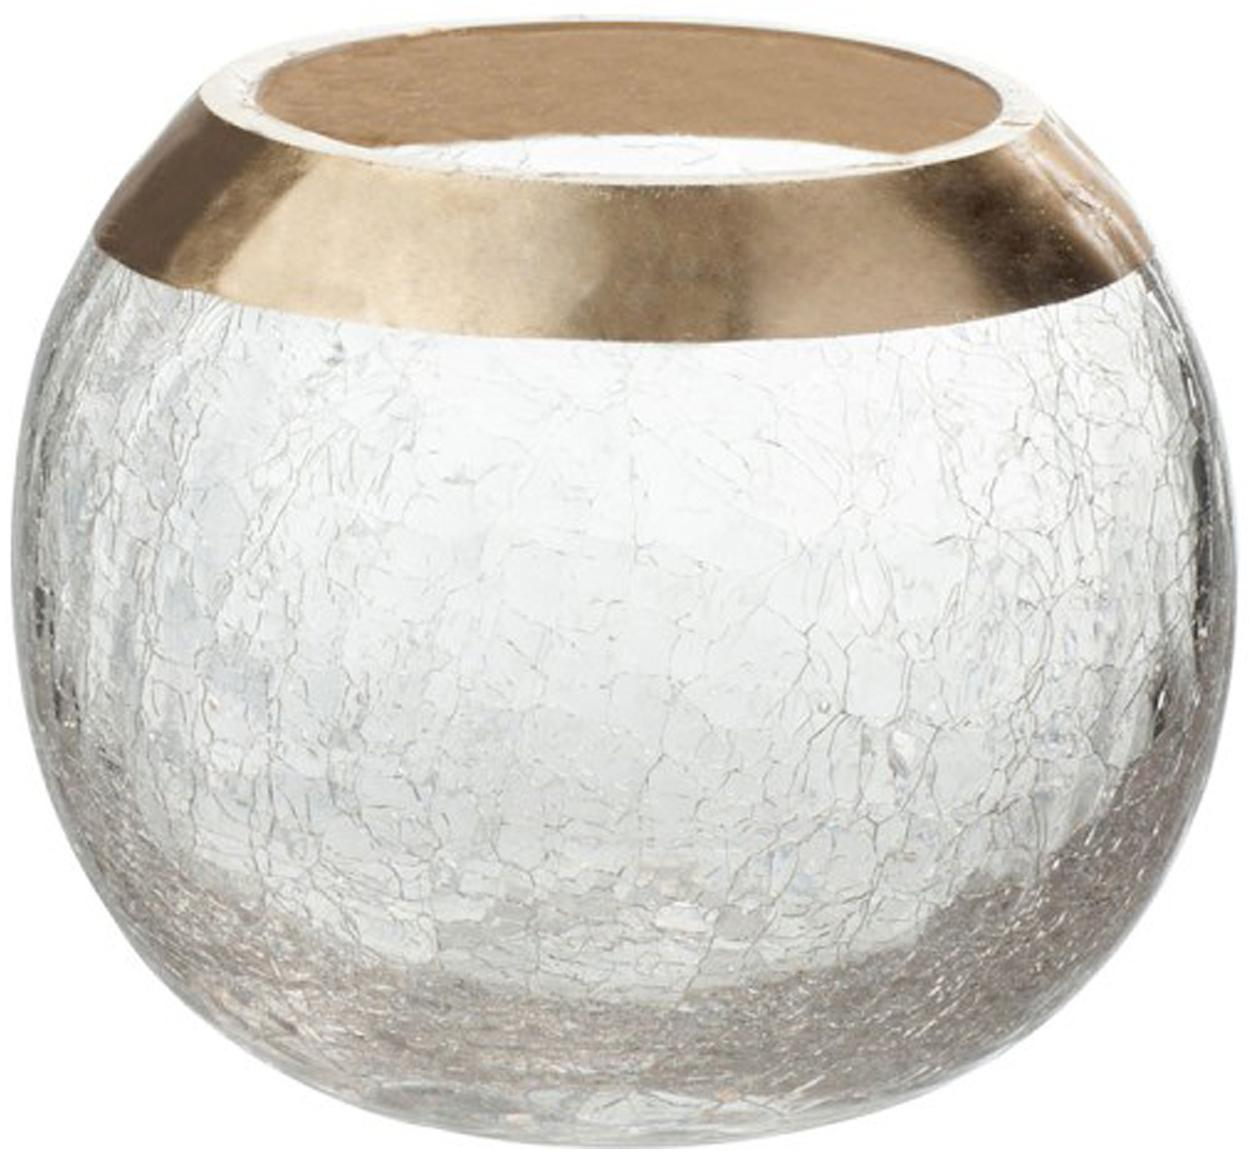 Waxinelichthouder Lackle, Gelakt glas, Transparant, goudkleurig, Ø 14 x H 11 cm